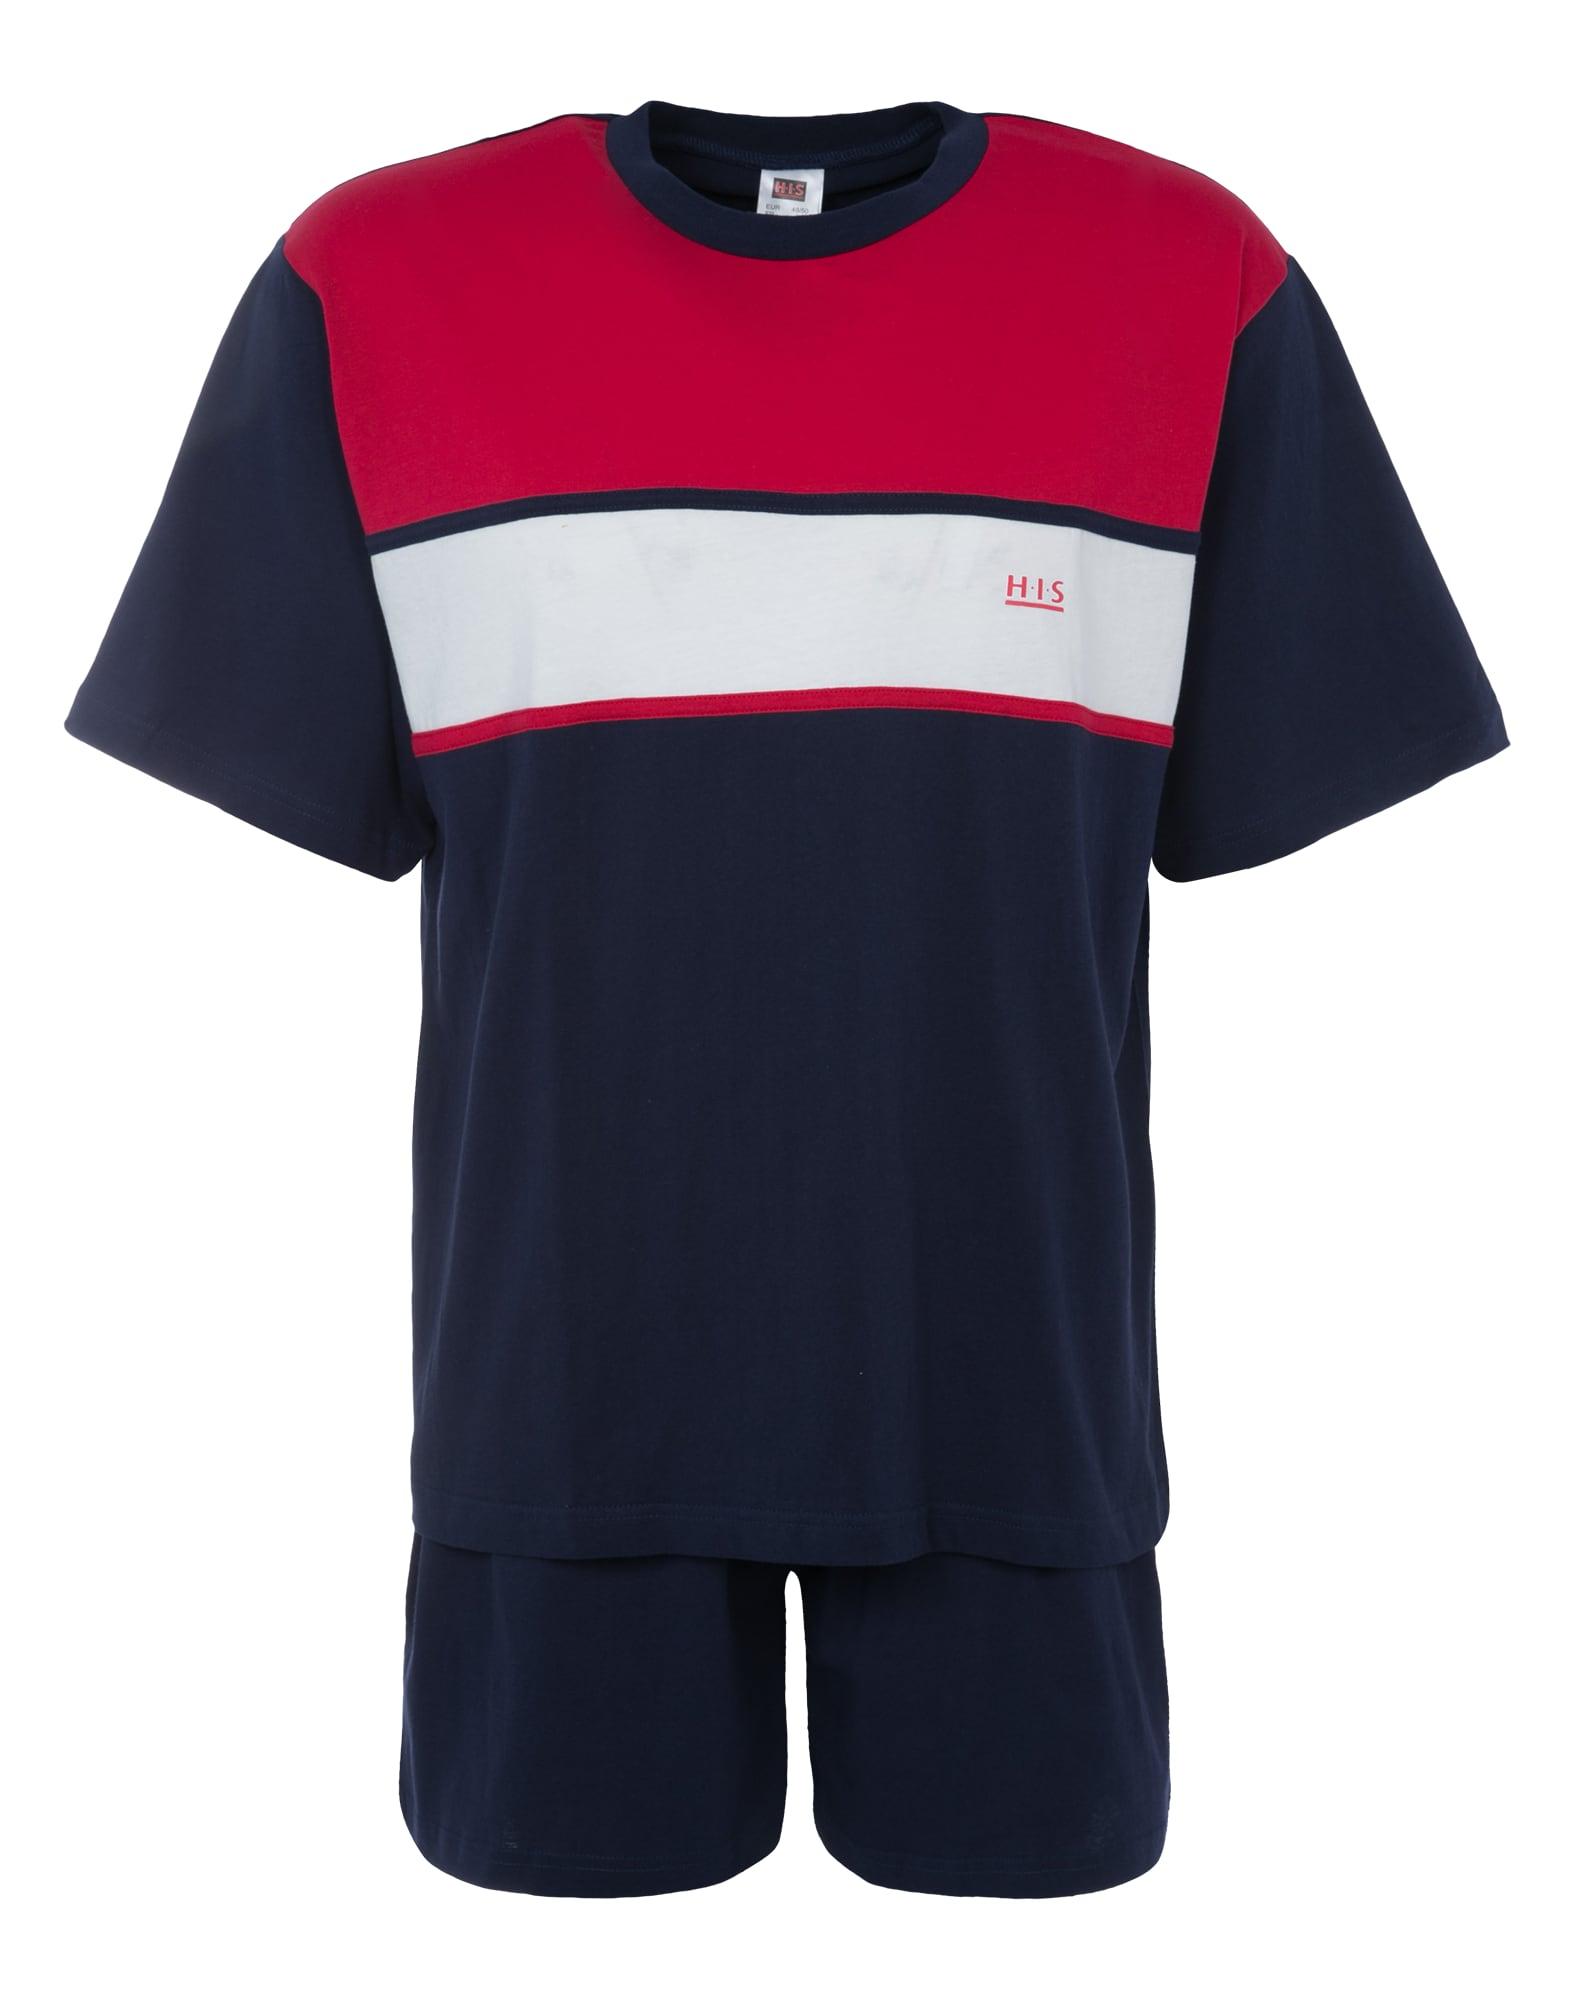 H.I.S Trumpa pižama raudona / balta / tamsiai mėlyna